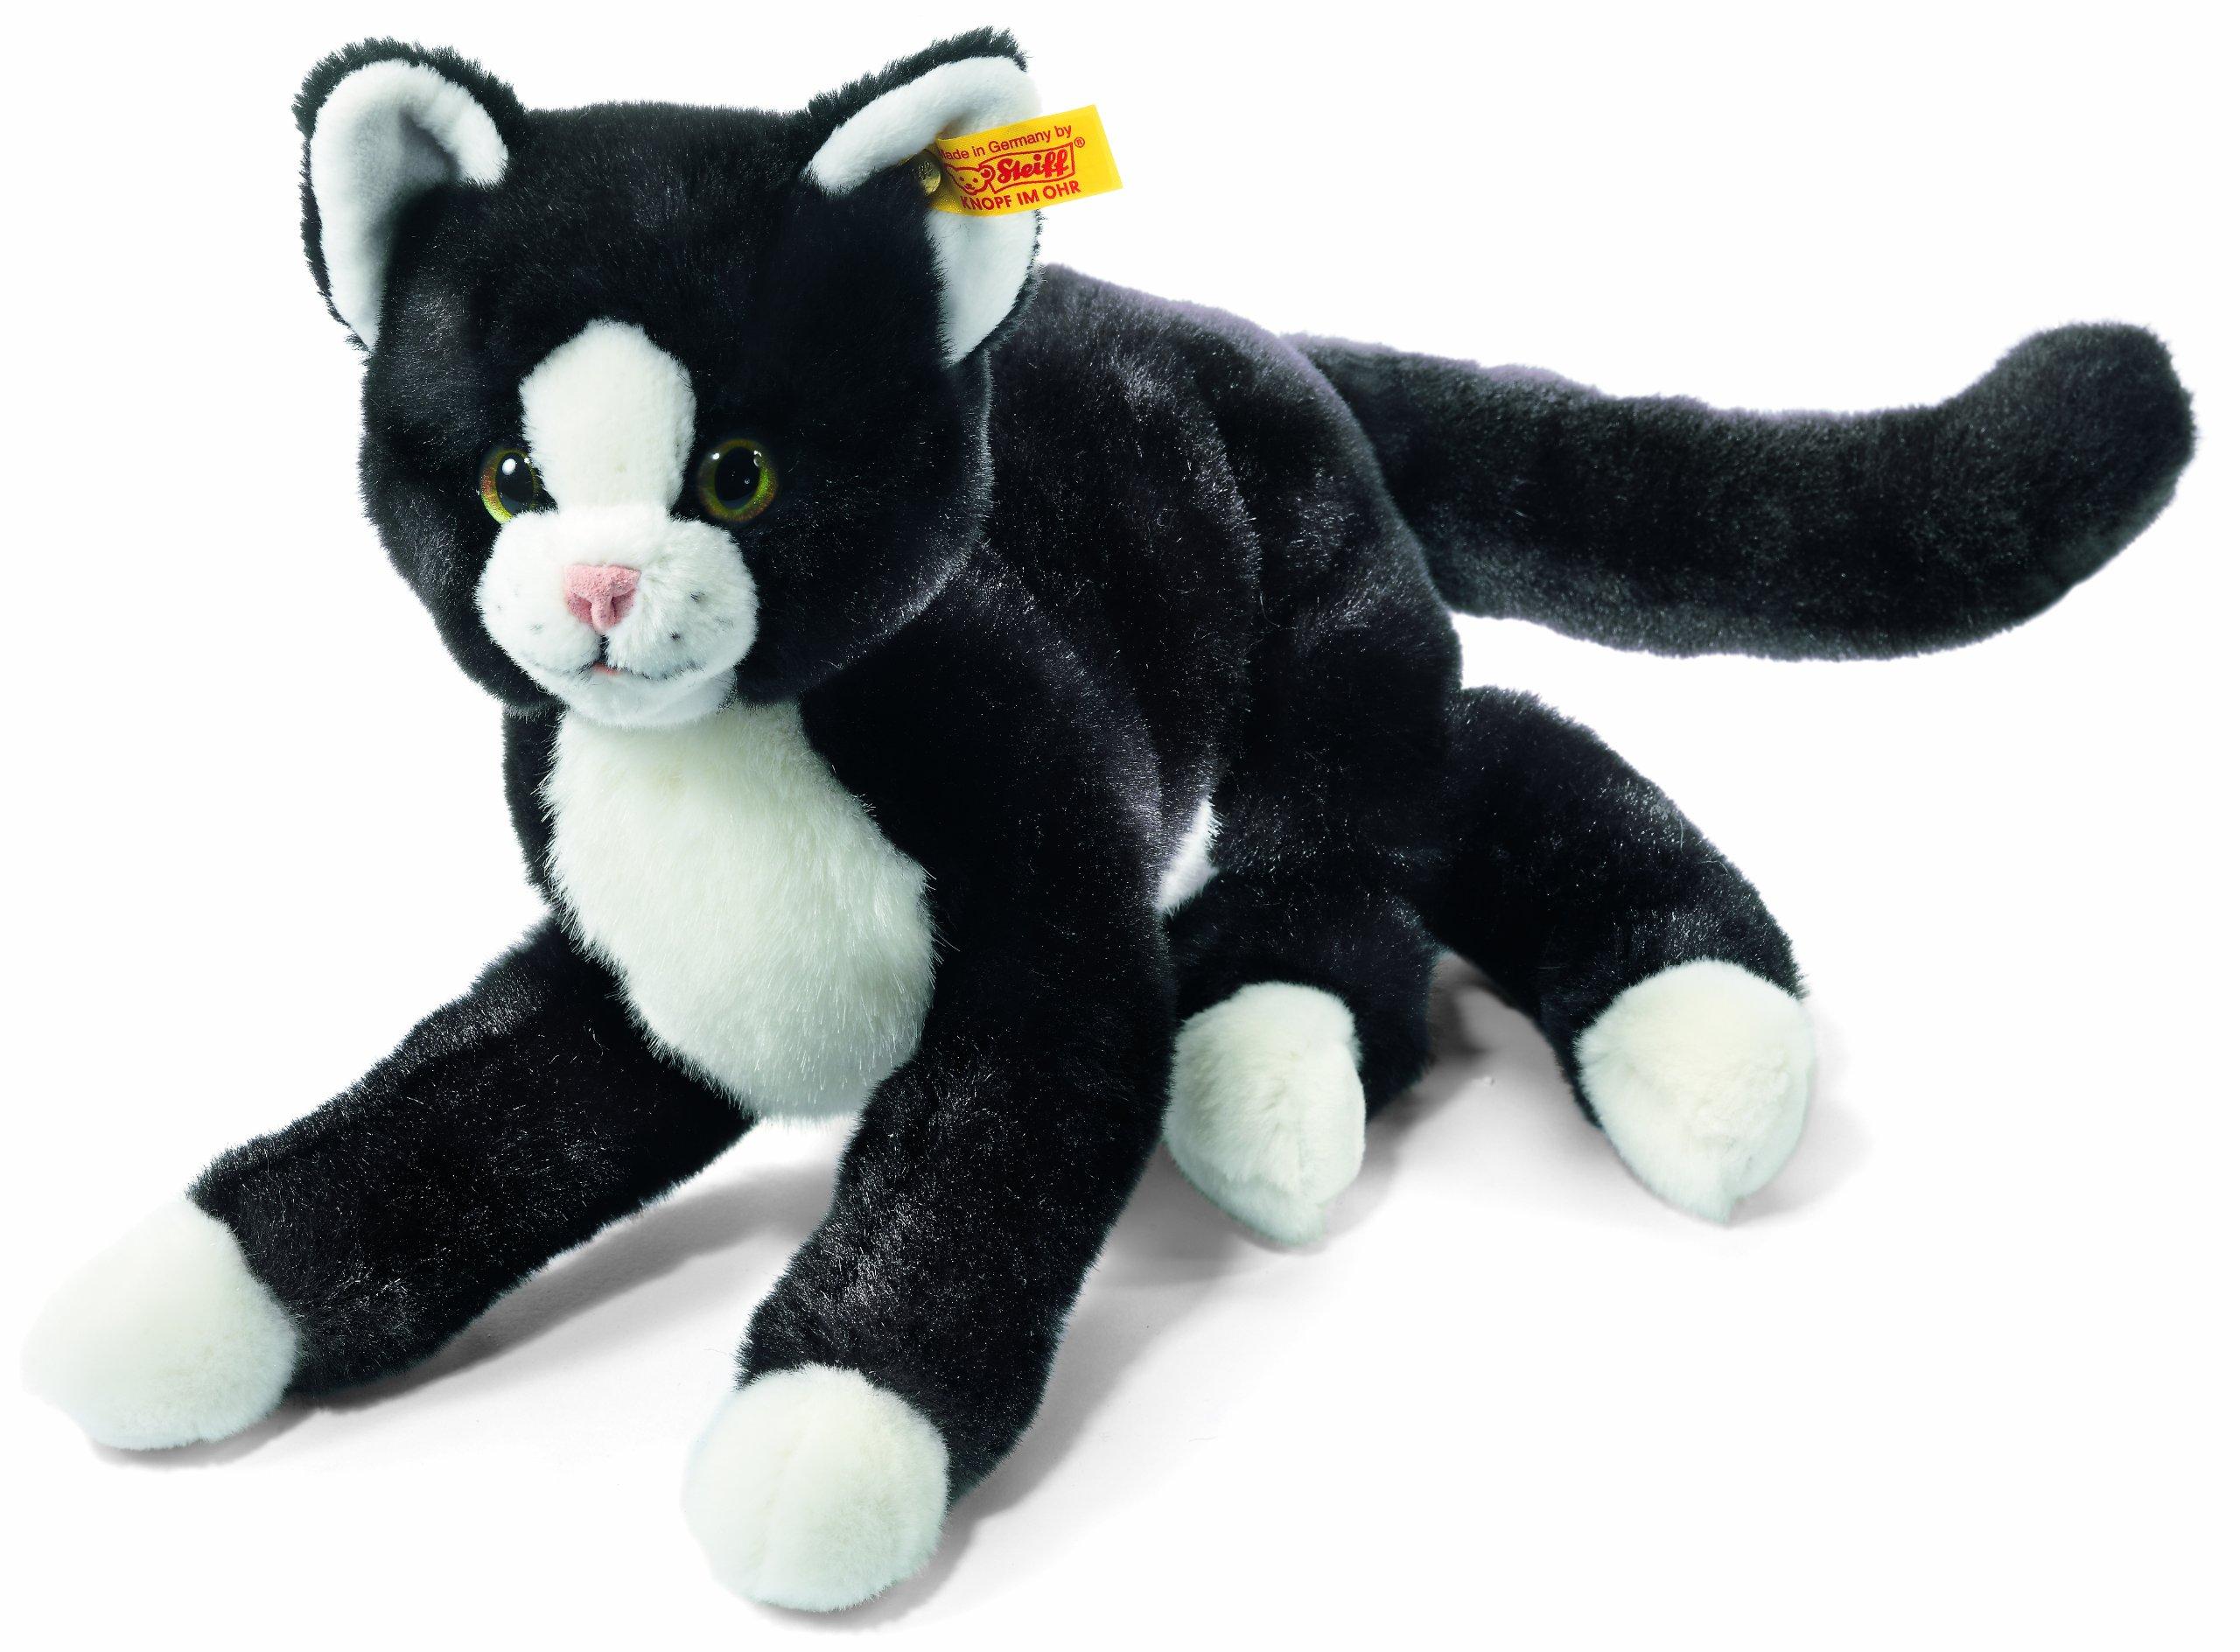 Steiff 099366 Mimi Cat Plush Animal Toy, Black/White by Steiff